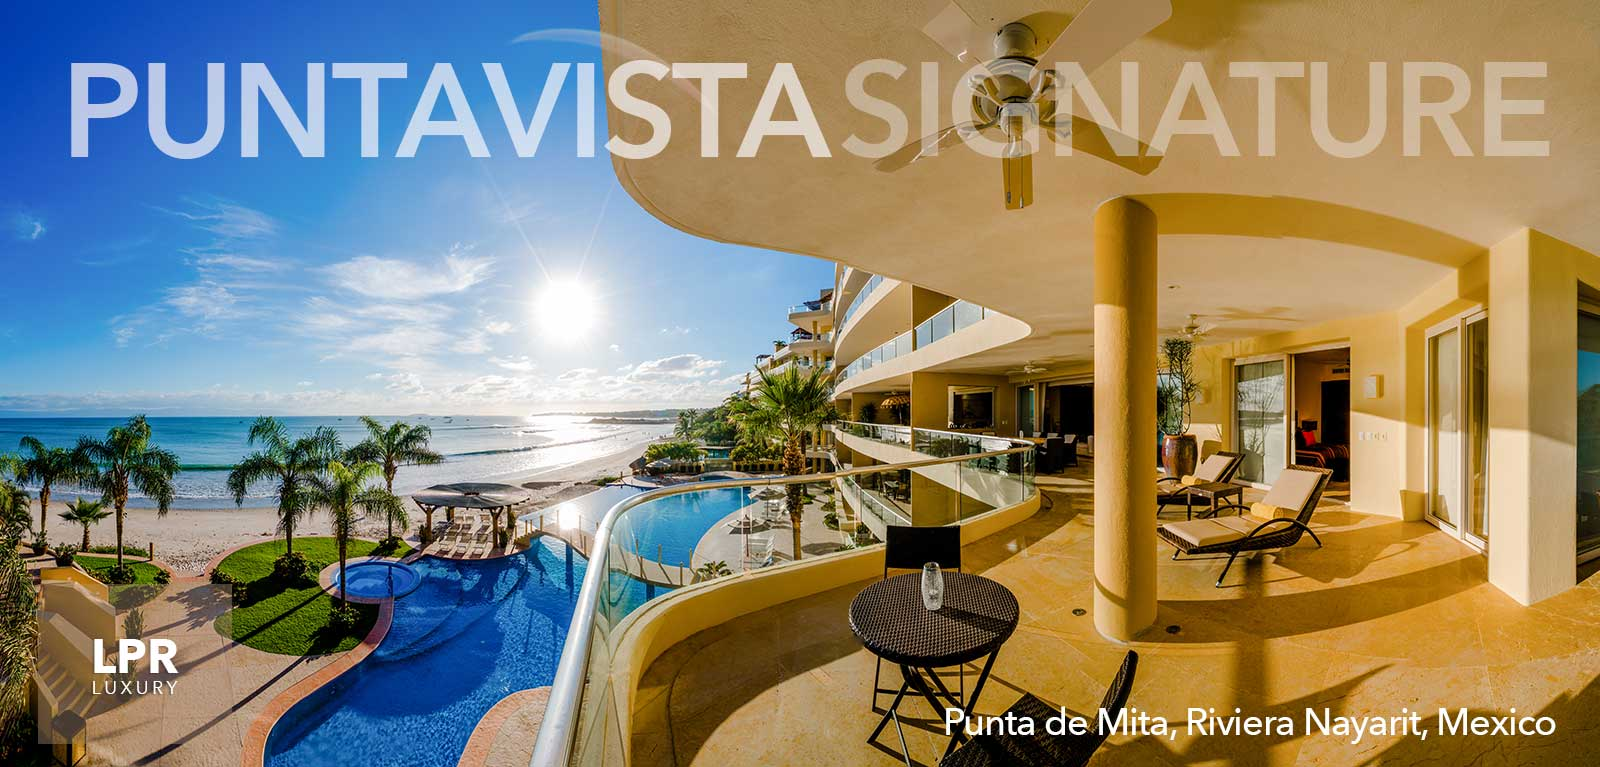 PVSR - Punta Vista Signature Residence - Playa Punta de Mita real estate and vacation rentals